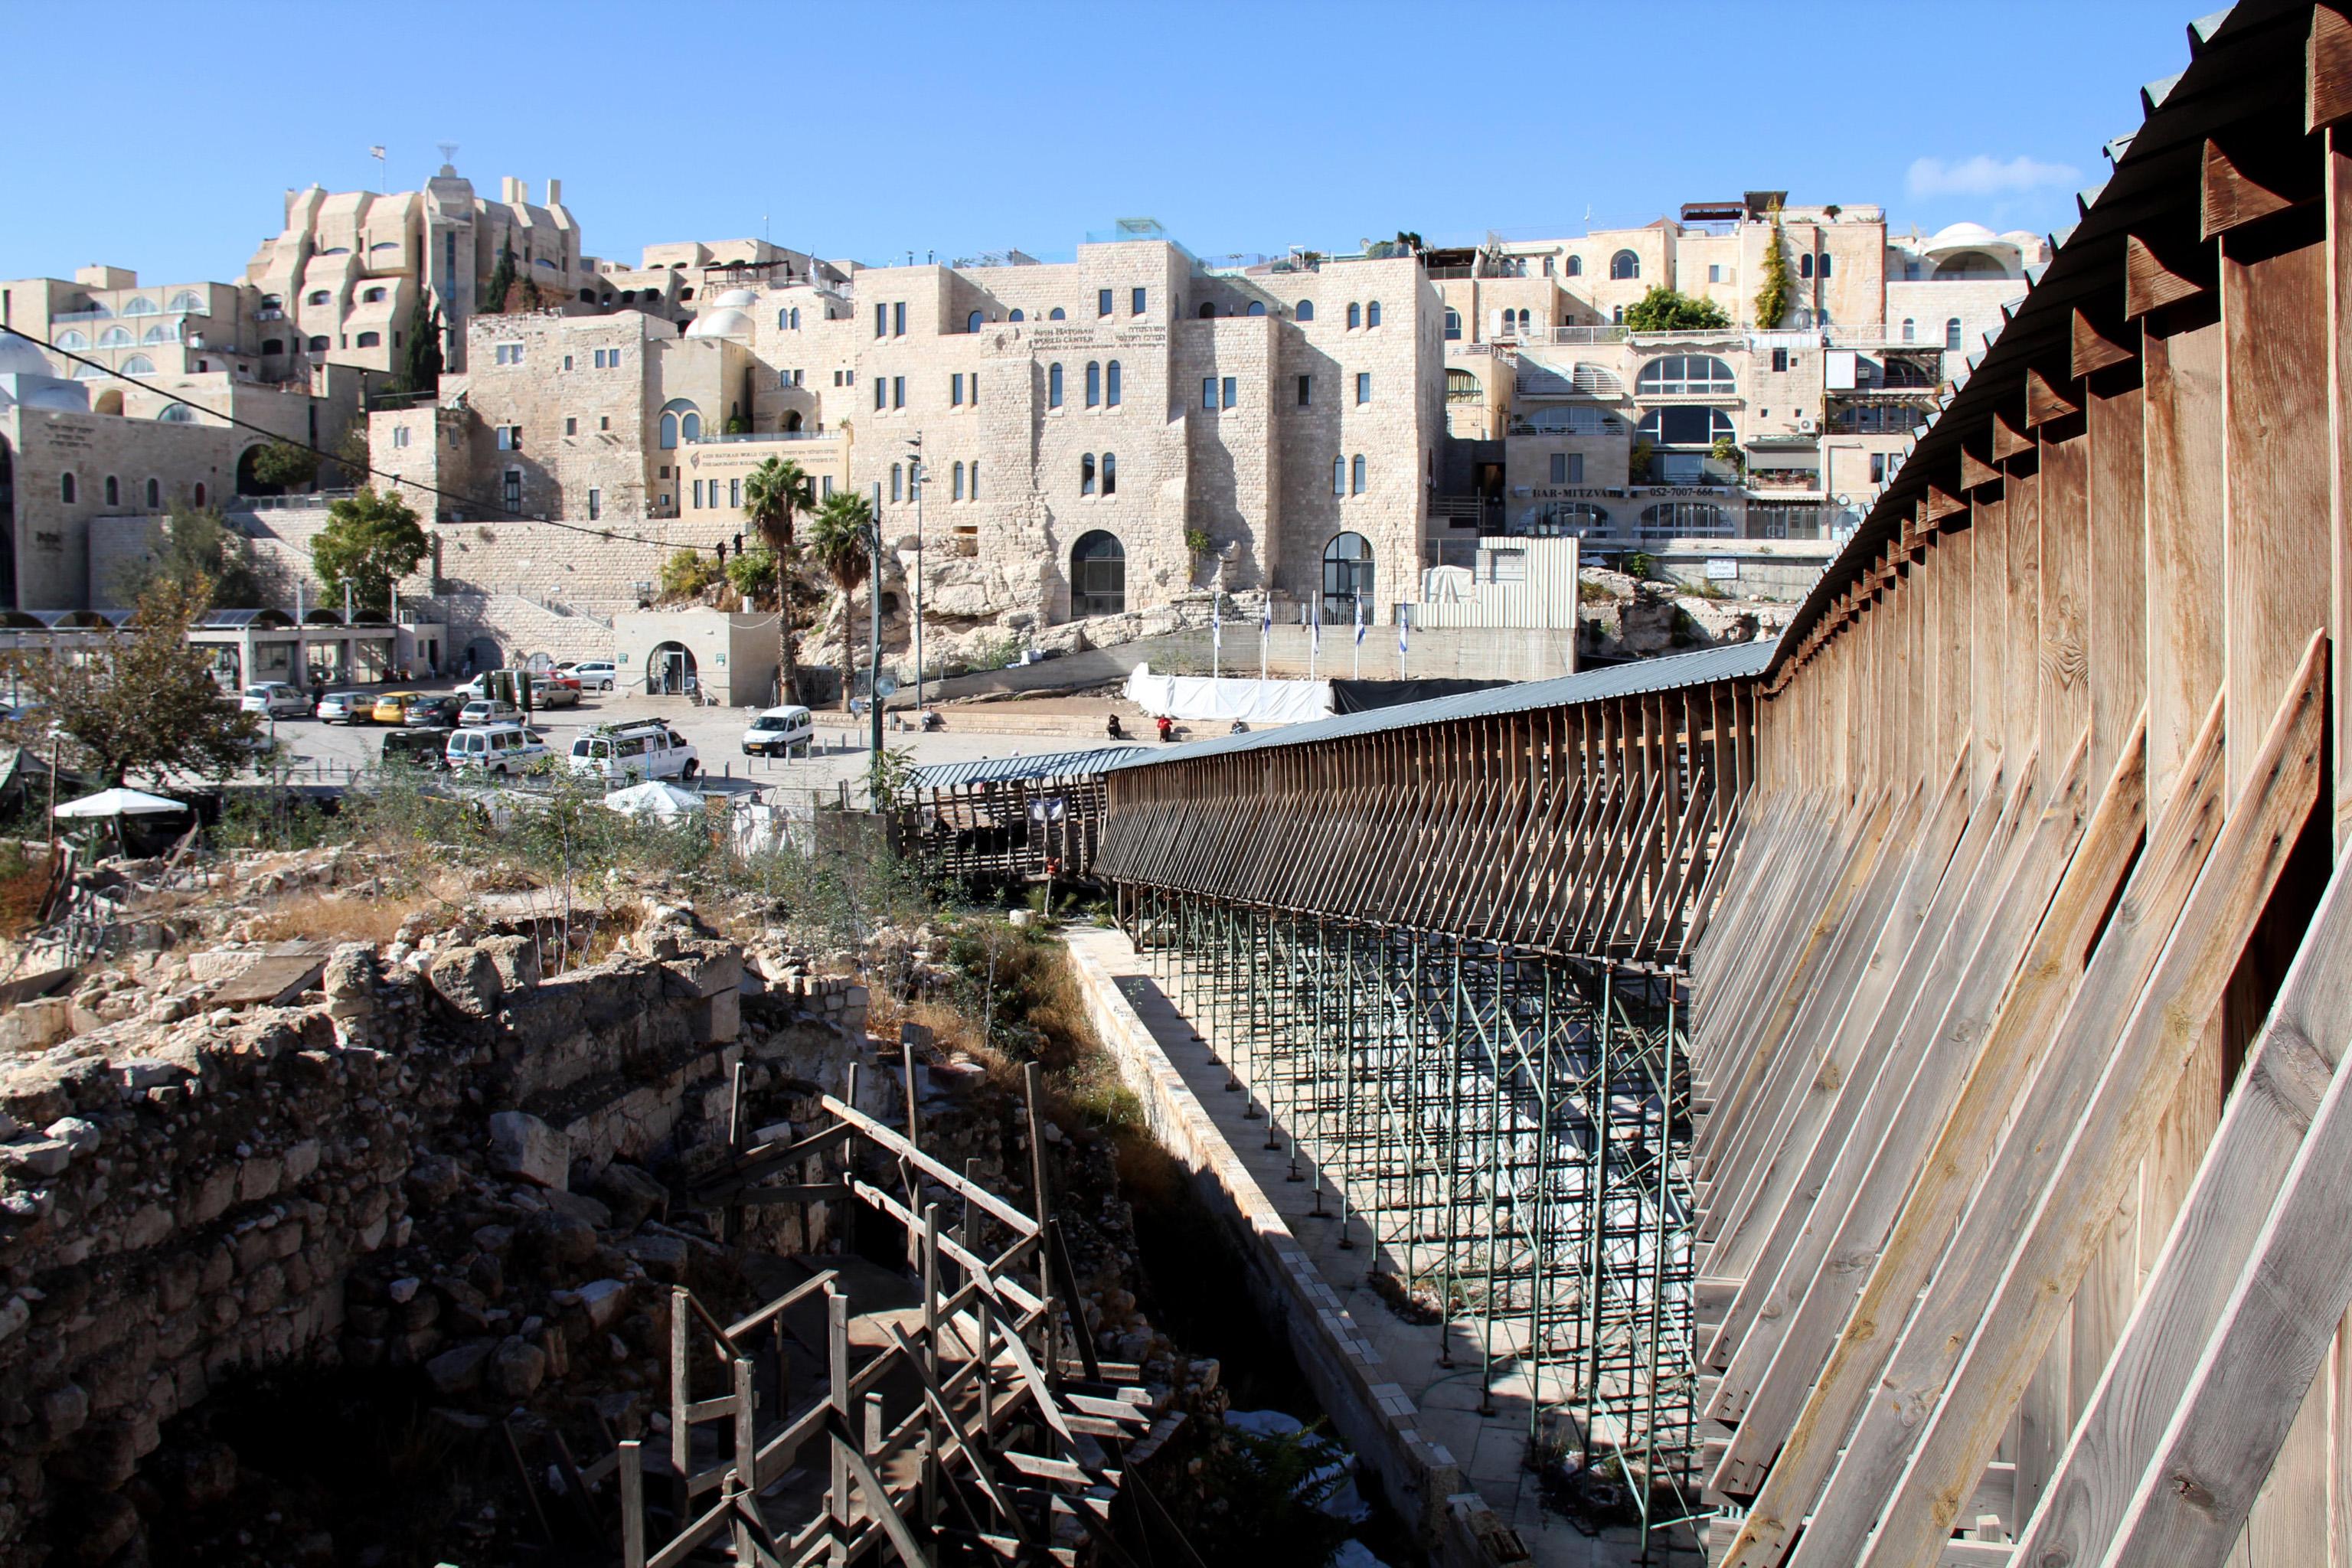 Israele si prepara a rivolta palestinese